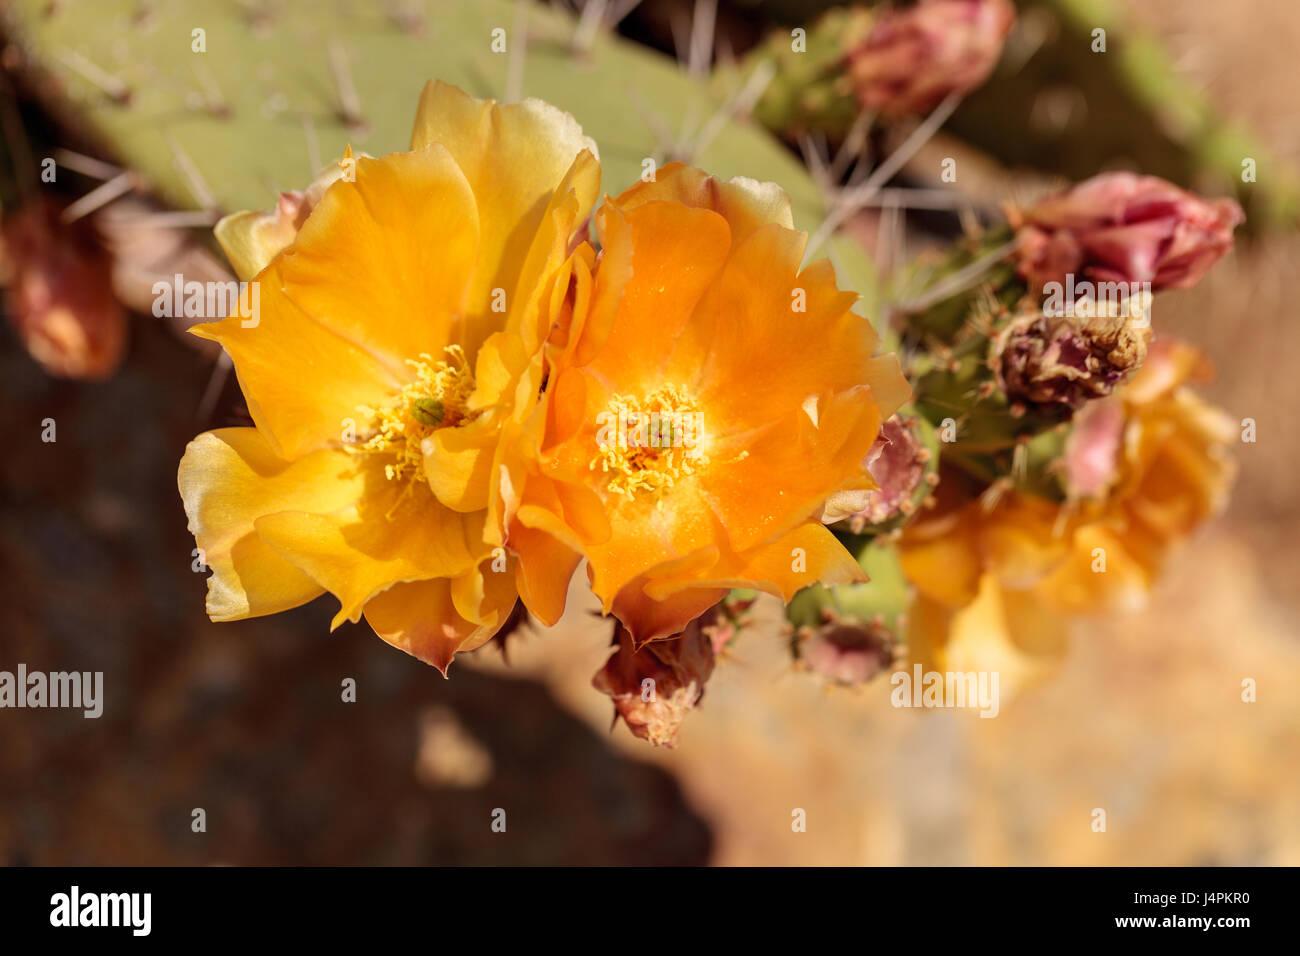 Yellow flowers on a coast barrel cactus san diego barrel cactus yellow flowers on a coast barrel cactus san diego barrel cactus also called ferocactus viridescens in a desert garden in southern california mightylinksfo